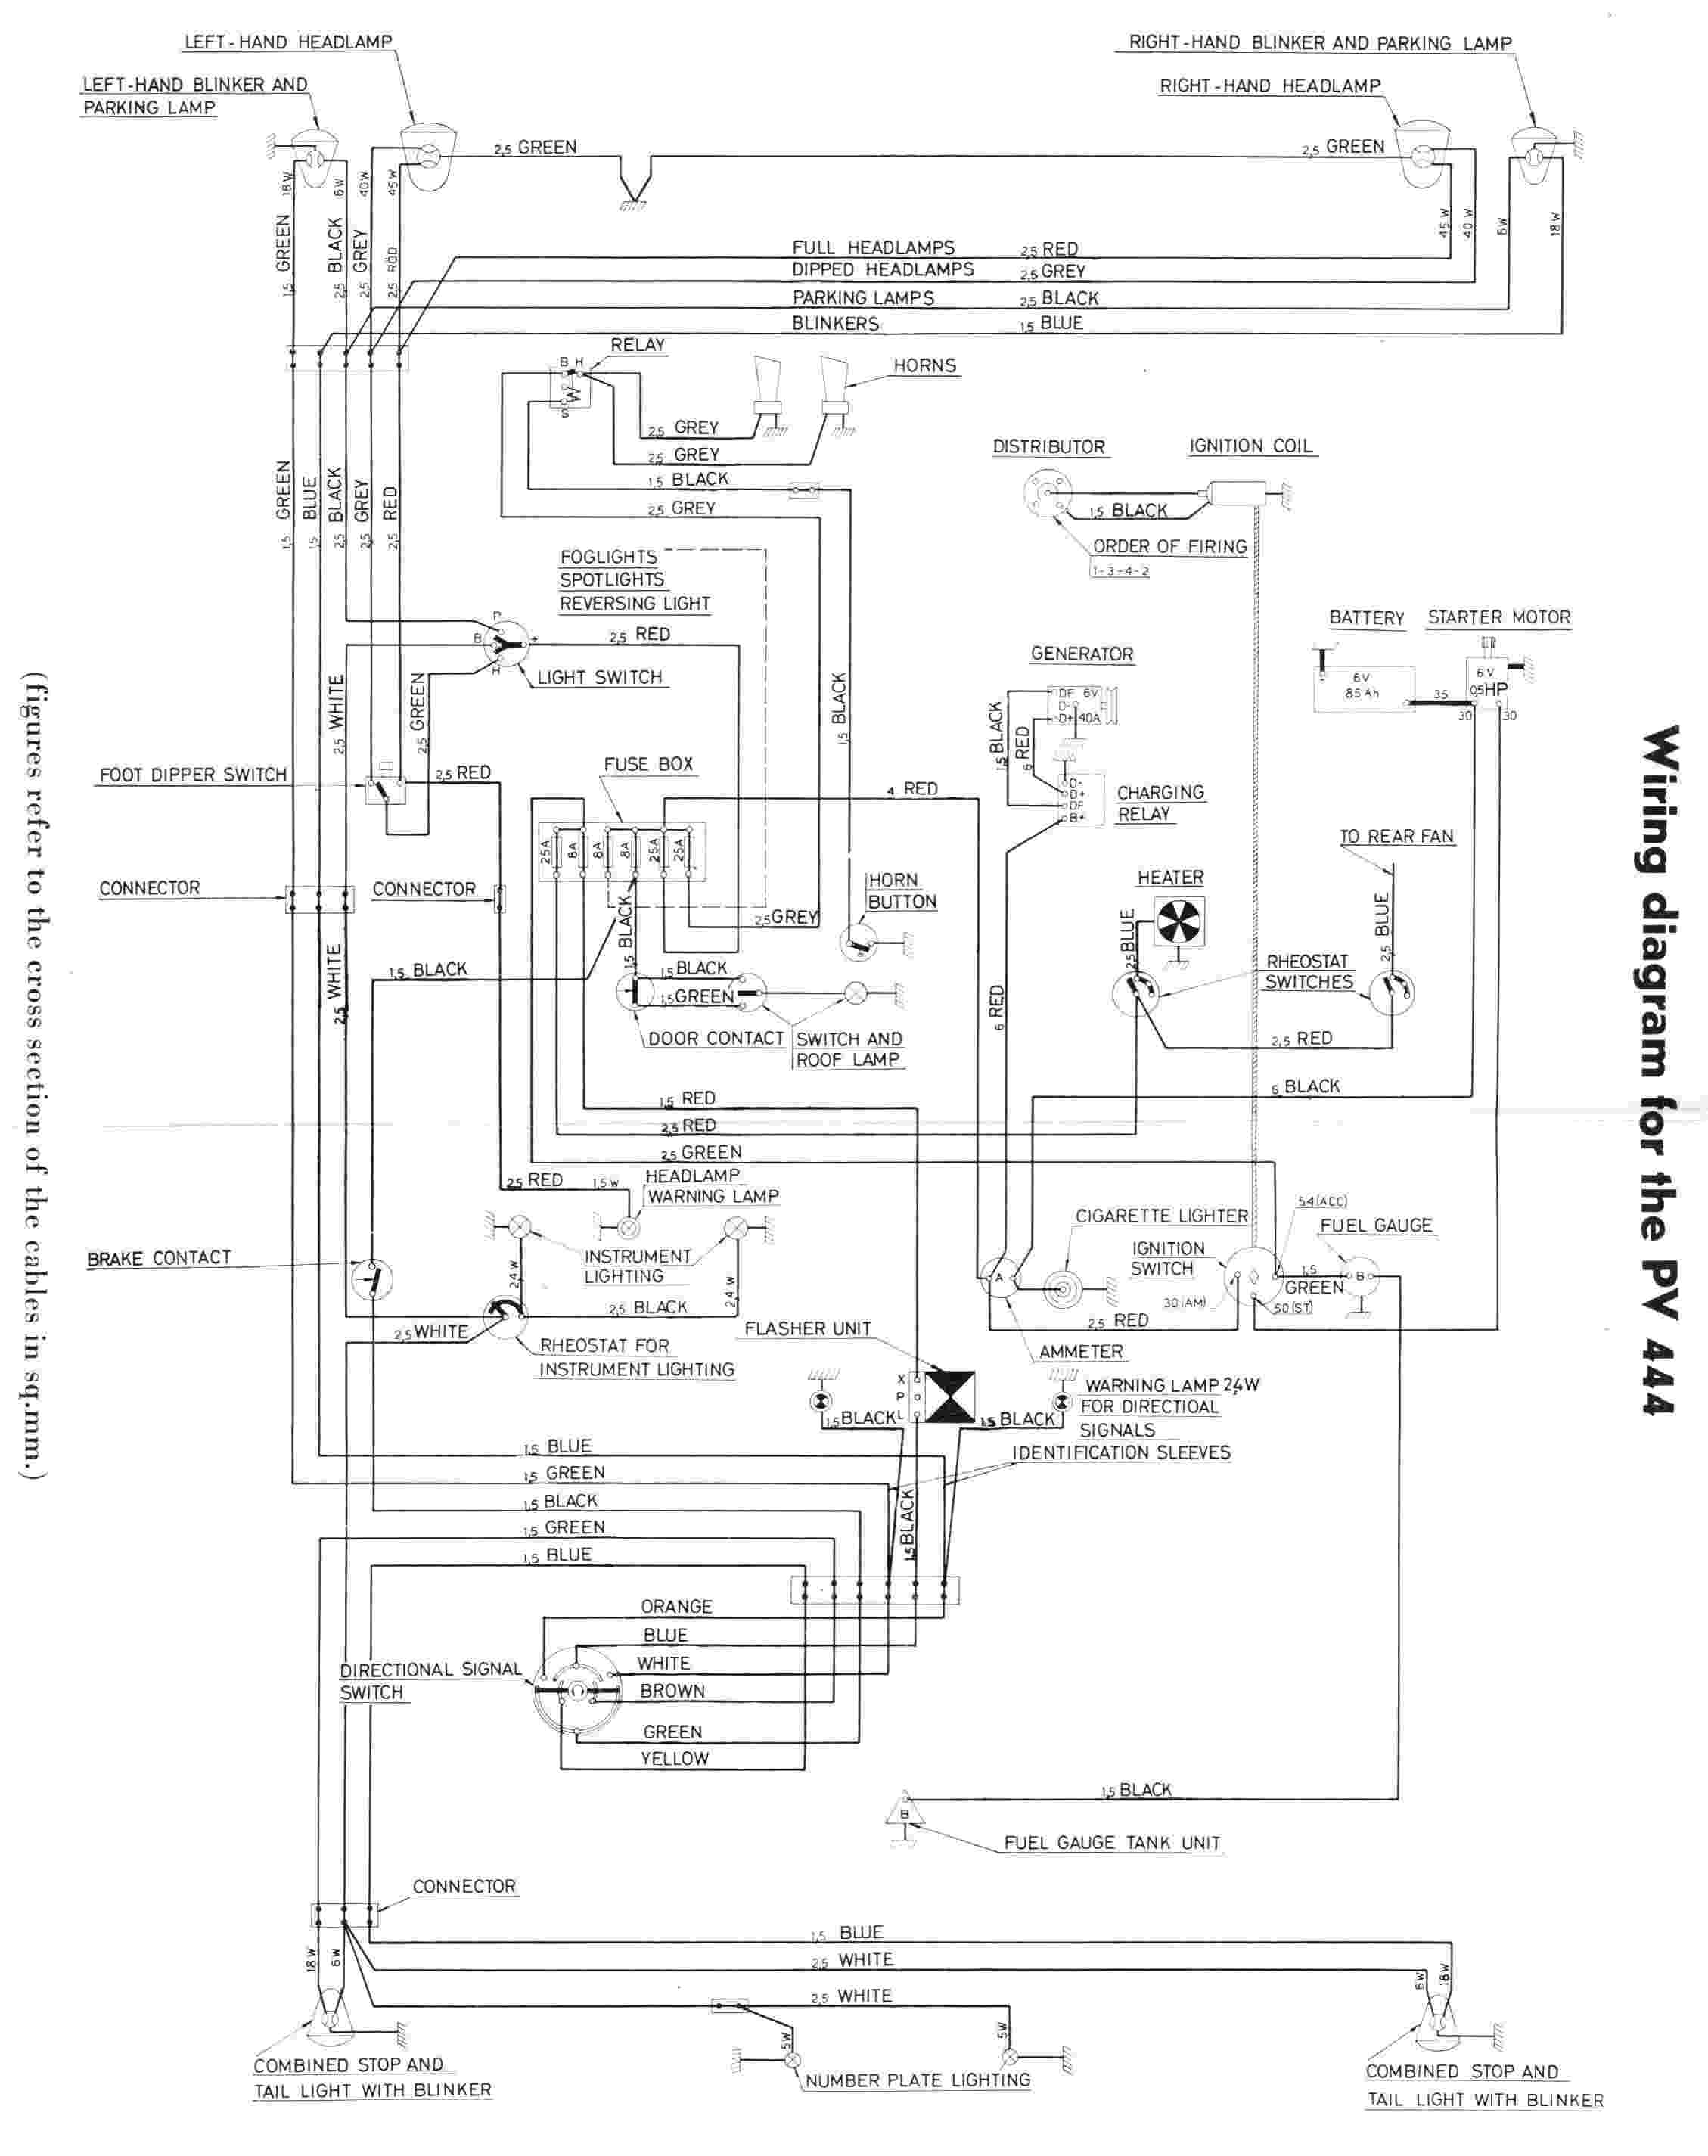 Citroen relay wiring diagram download wiring diagrams schematics magnificent citroen xsara picasso wiring diagram component relay pump diagram relay drawing dorable citroen relay wiring swarovskicordoba Images